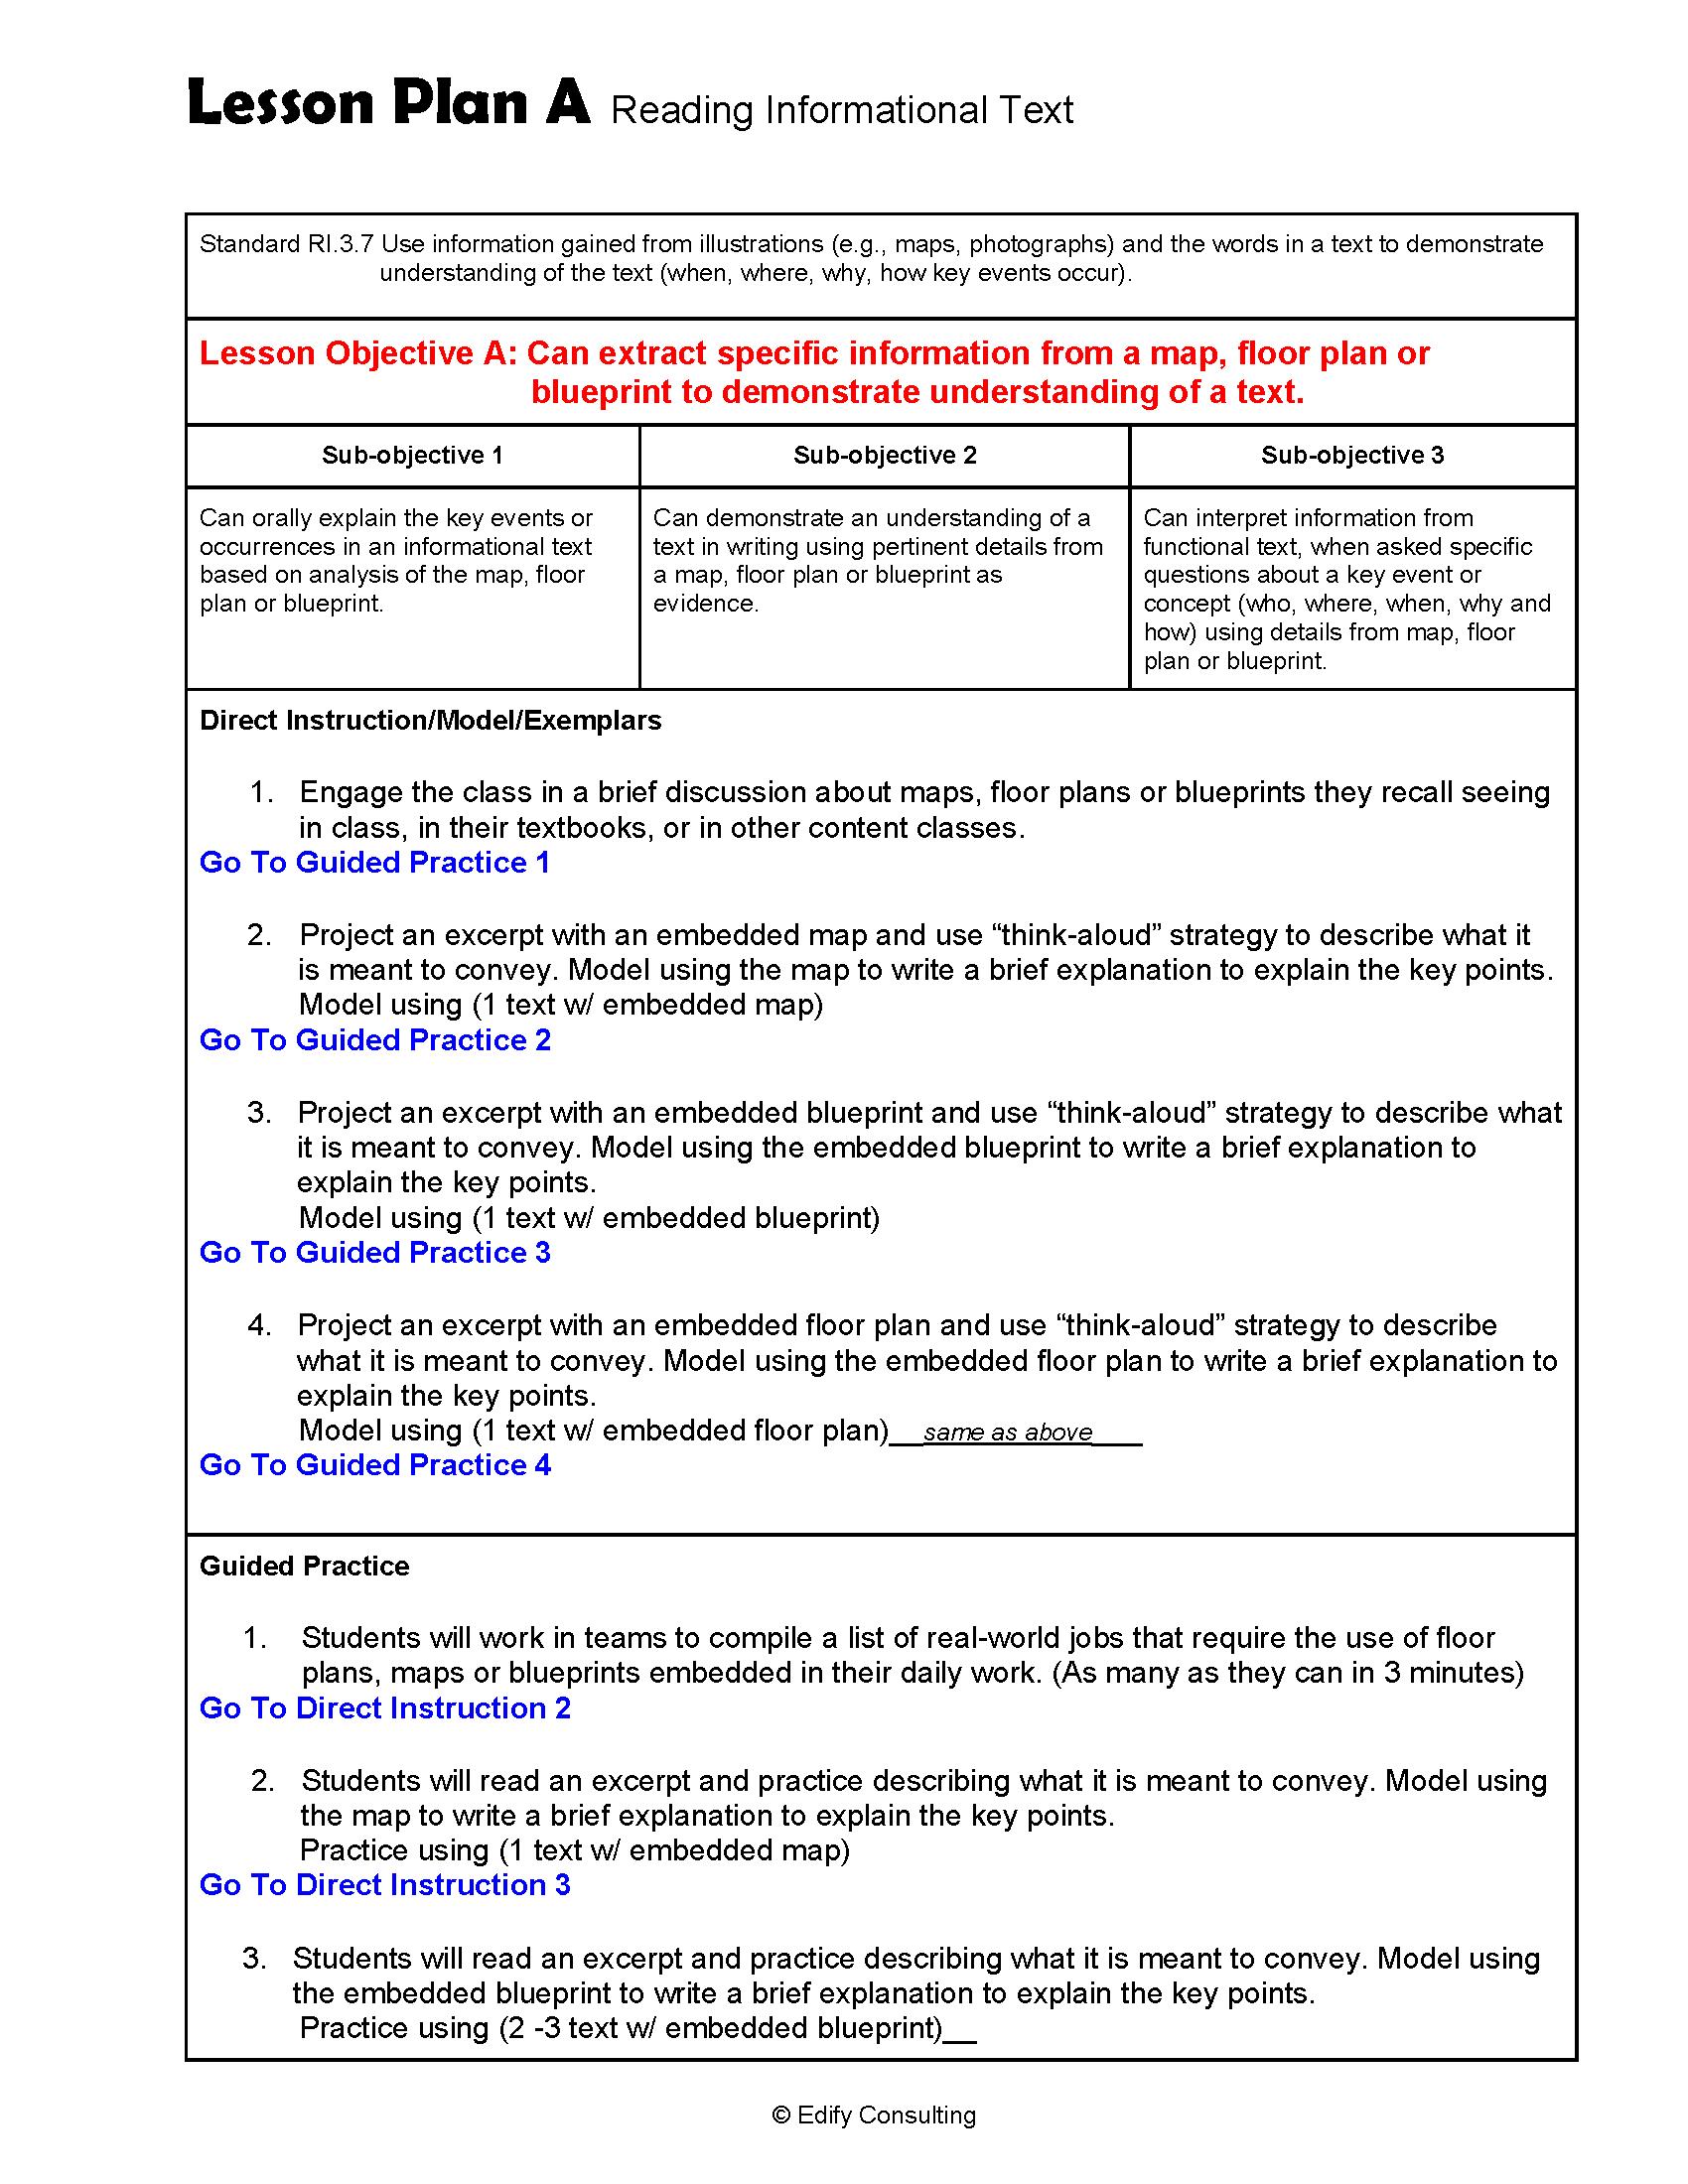 New Jersey Lesson Plans Ri 3 7 Ela 3rd Grade 5 Lesson Plans Edify Consulting